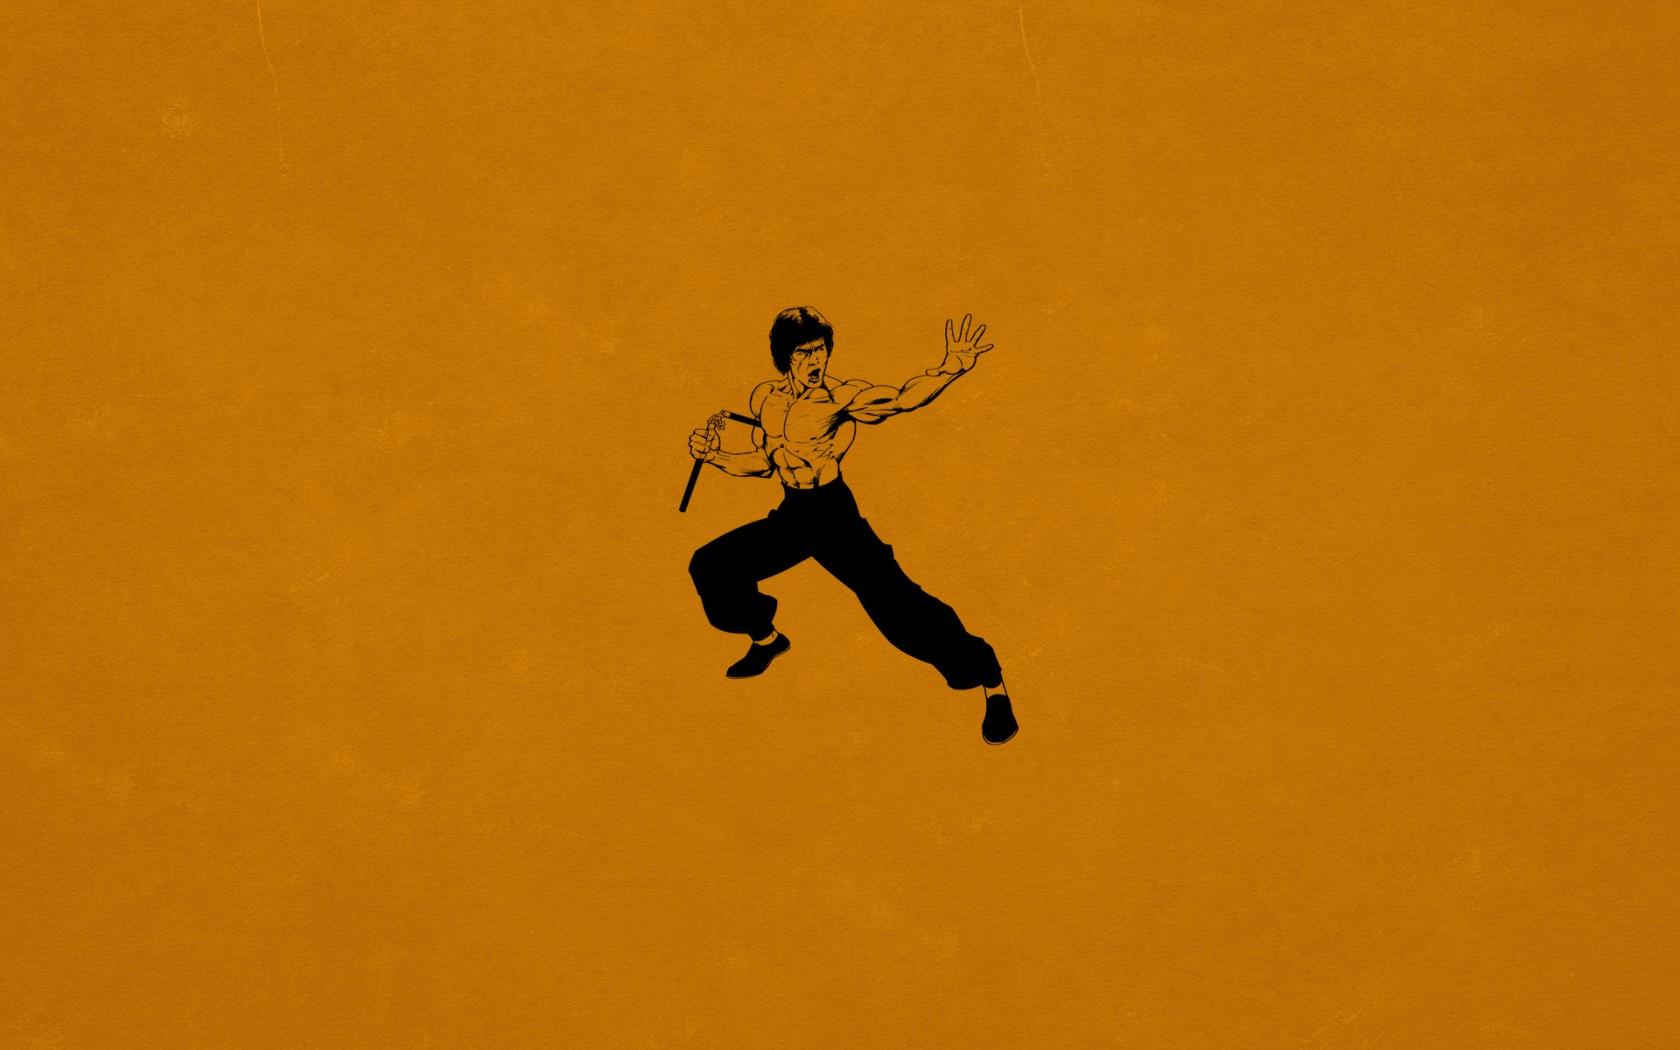 Bruce Lee Wallpaper 5